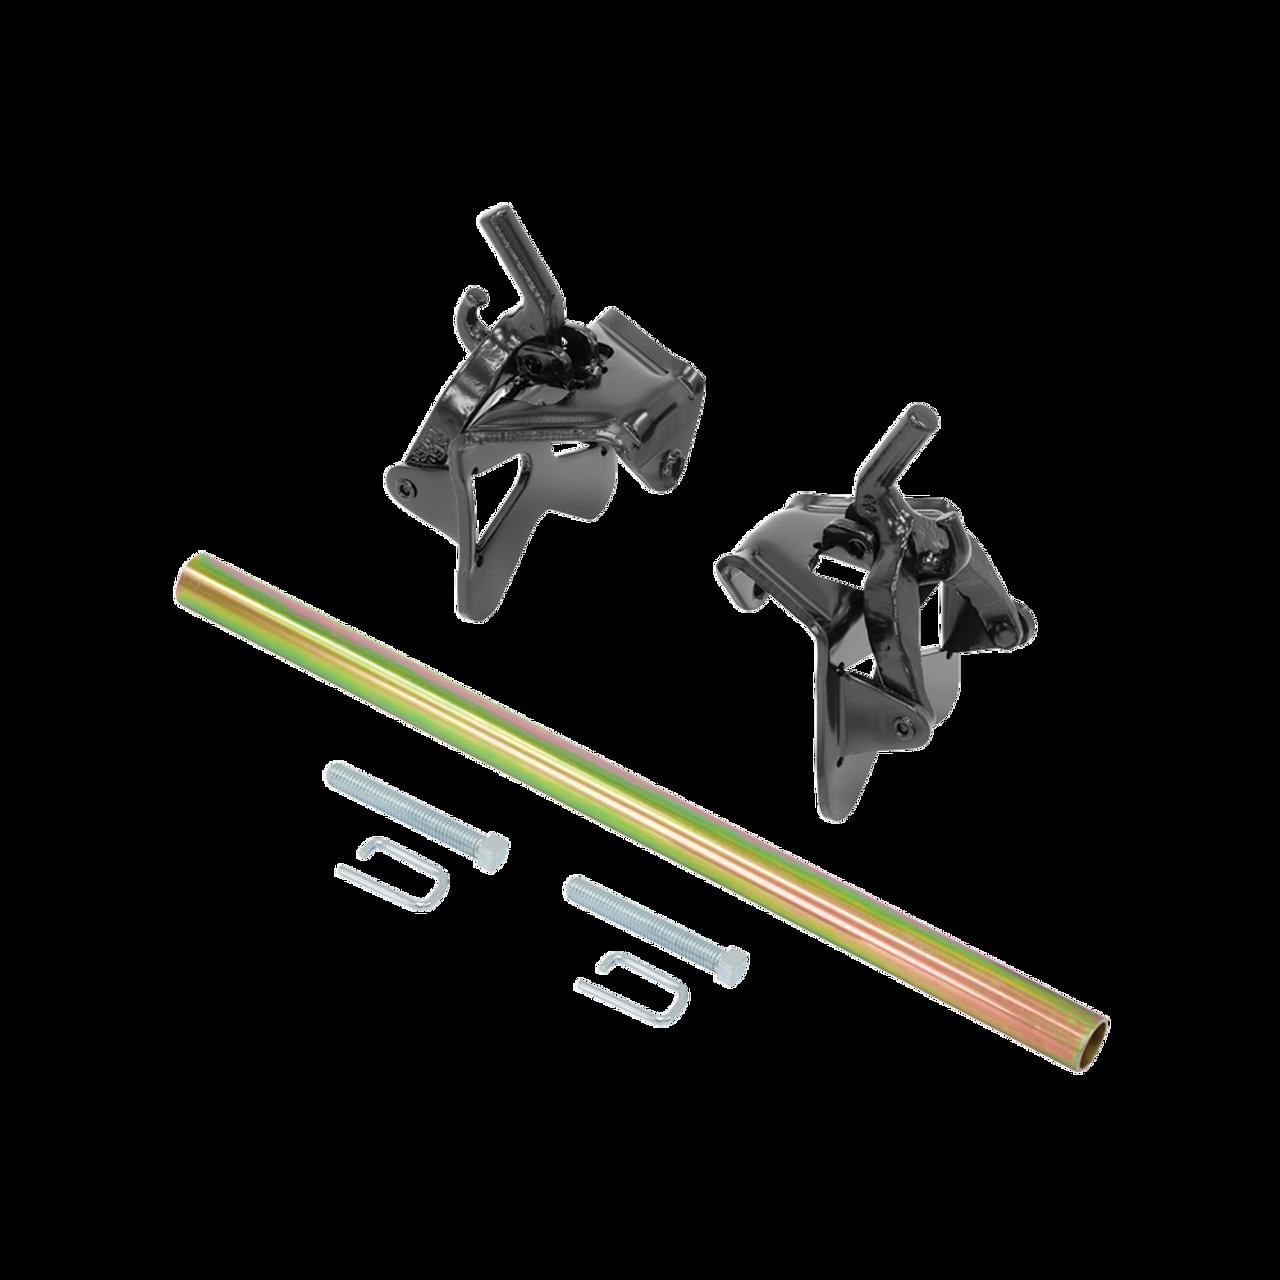 6637 --- Draw-Tite Replacement Lift Bracket Kit